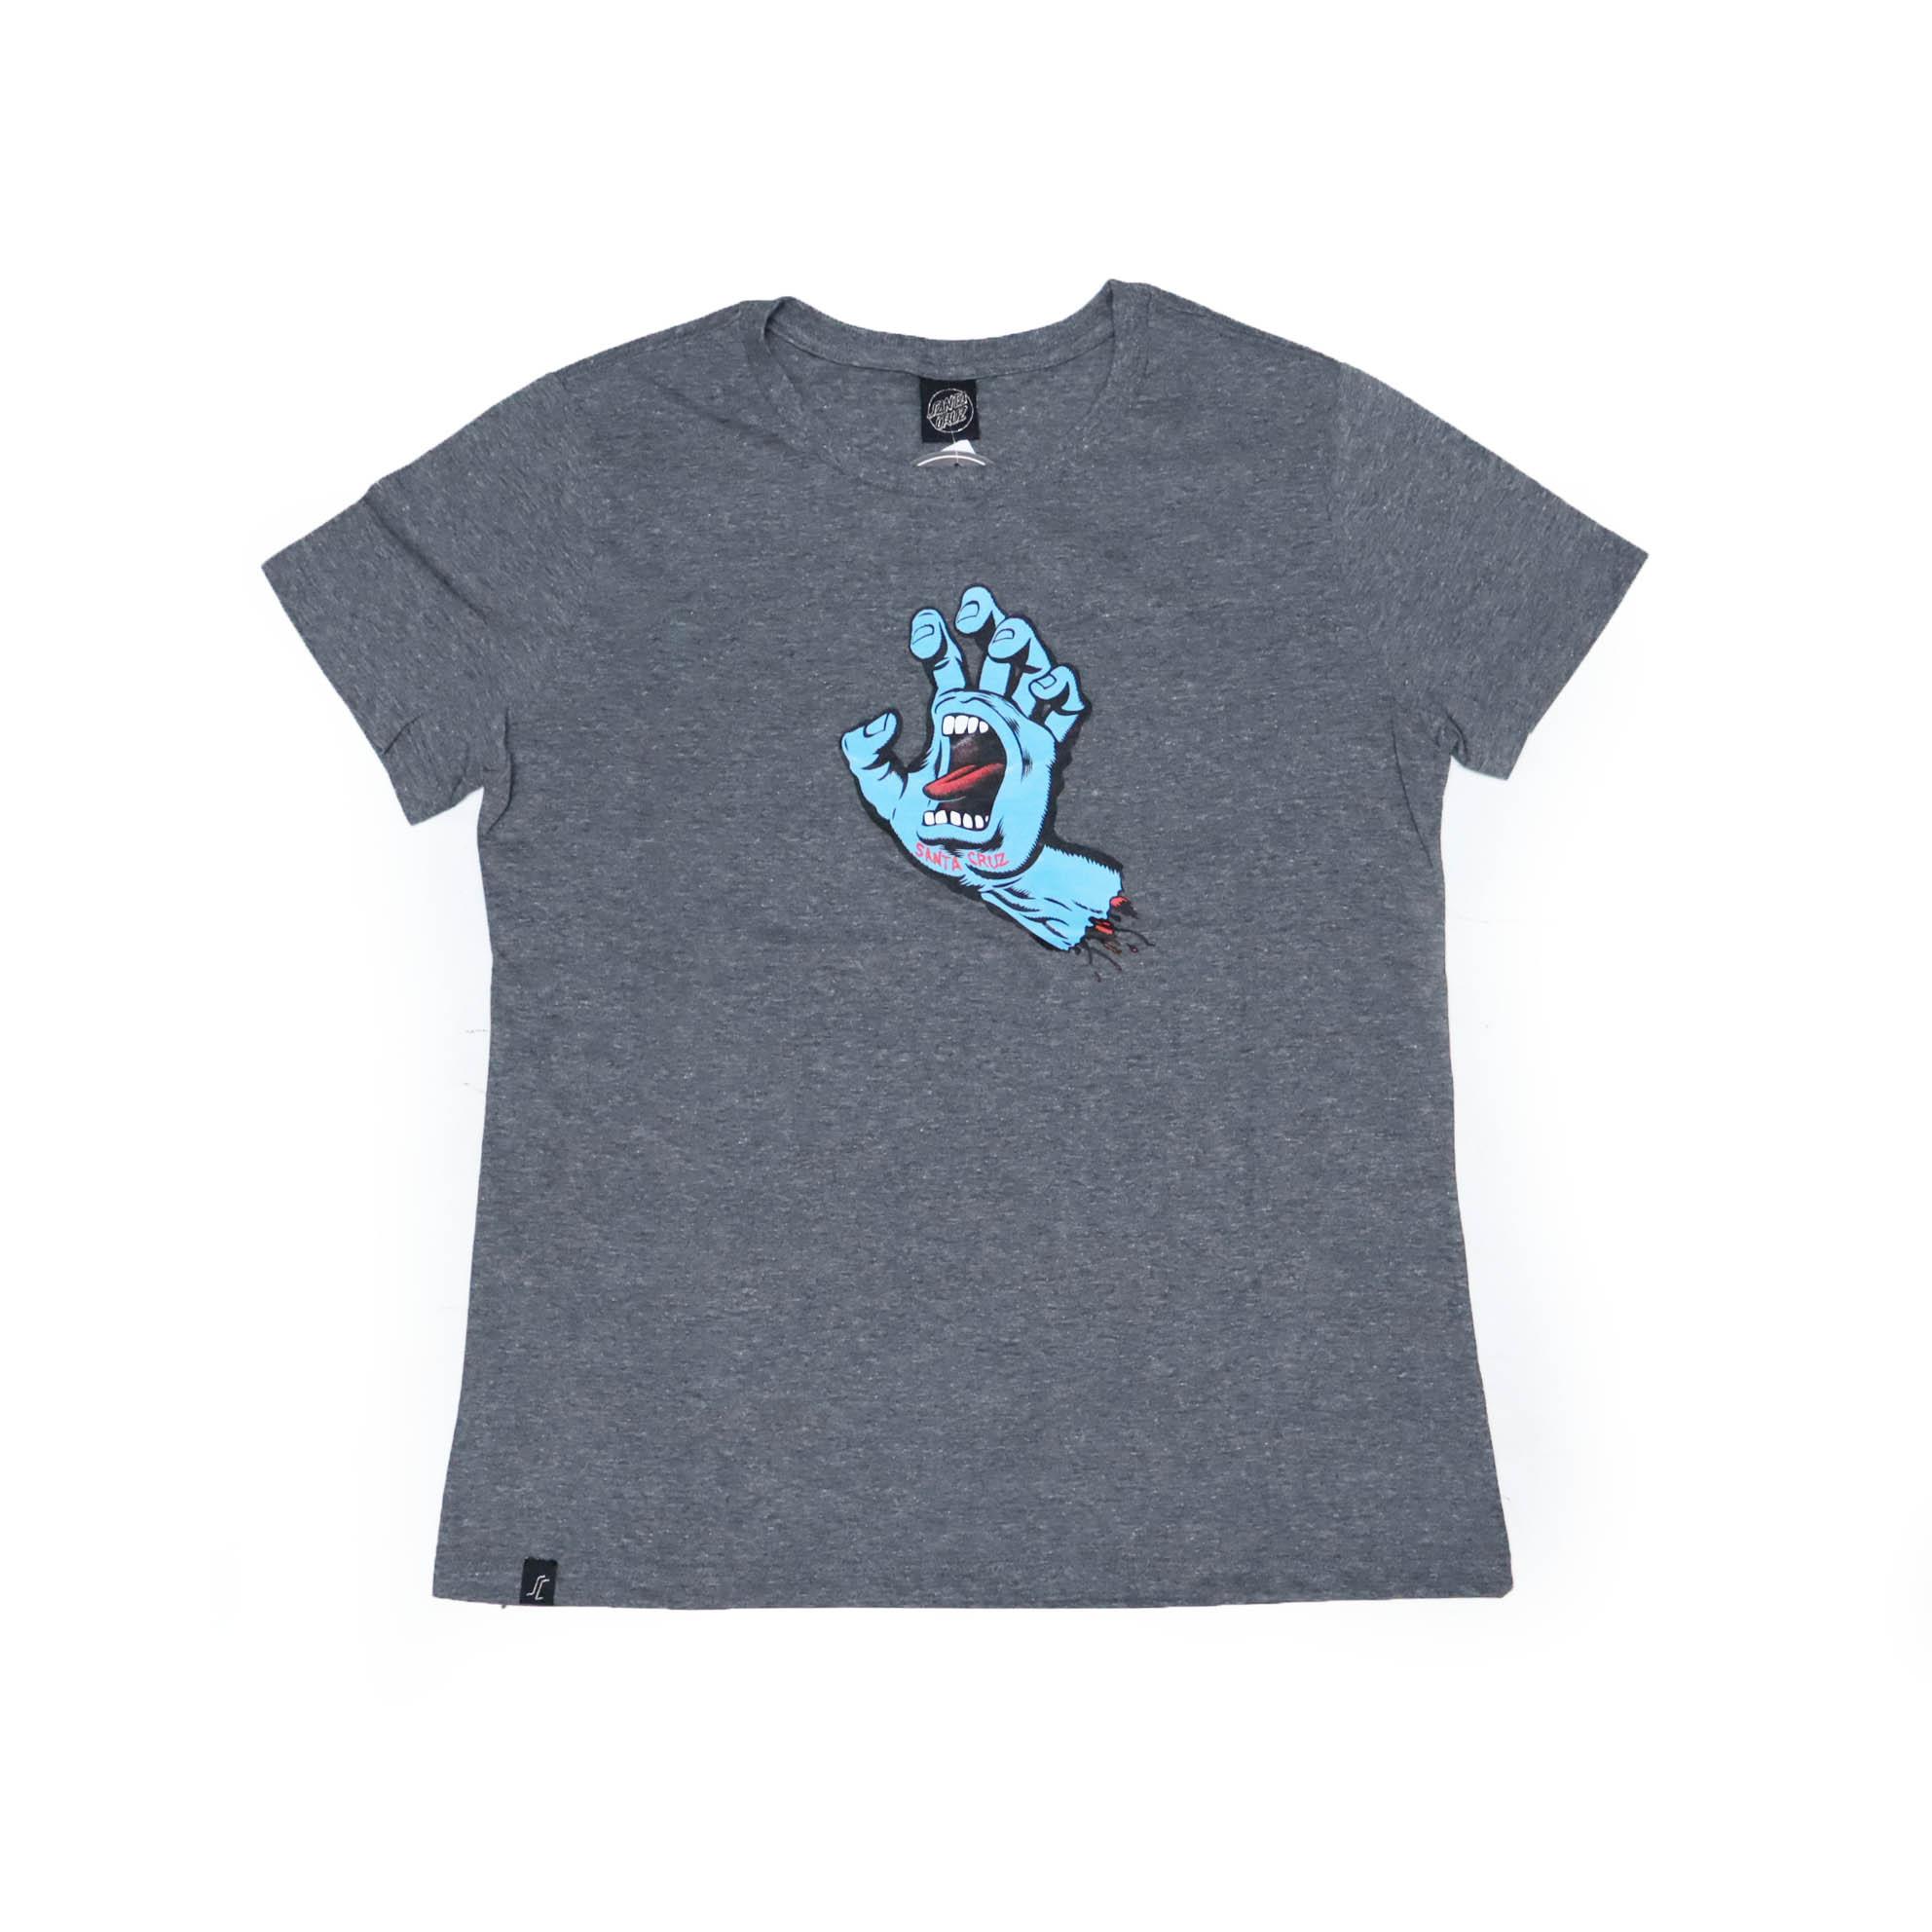 Camiseta Feminina Santa Cruz Sreaming Hand Front - Chumbo Mescla/Azul